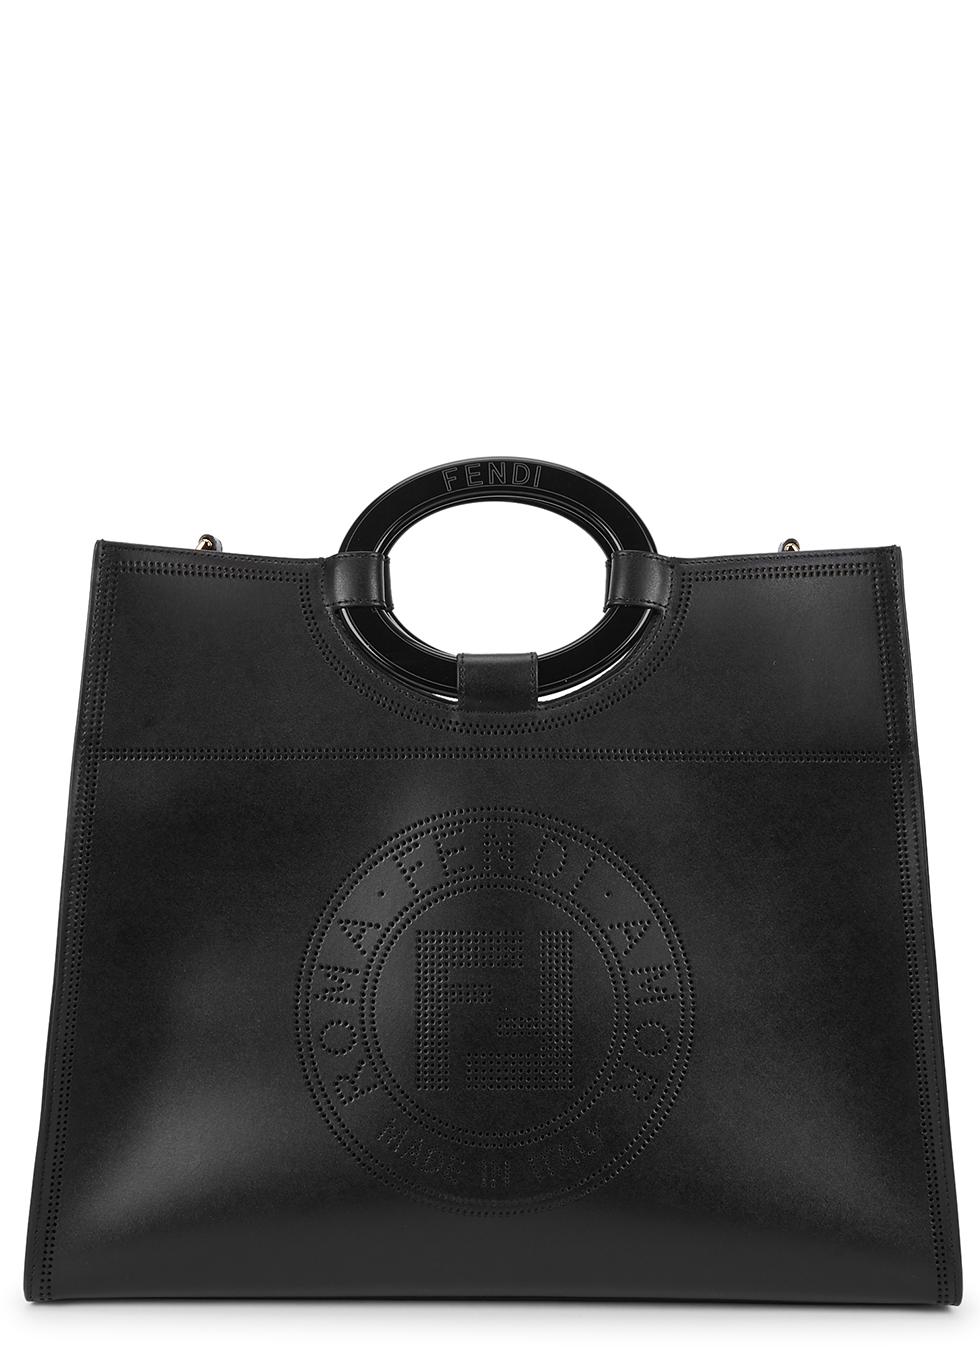 Runaway black logo leather tote